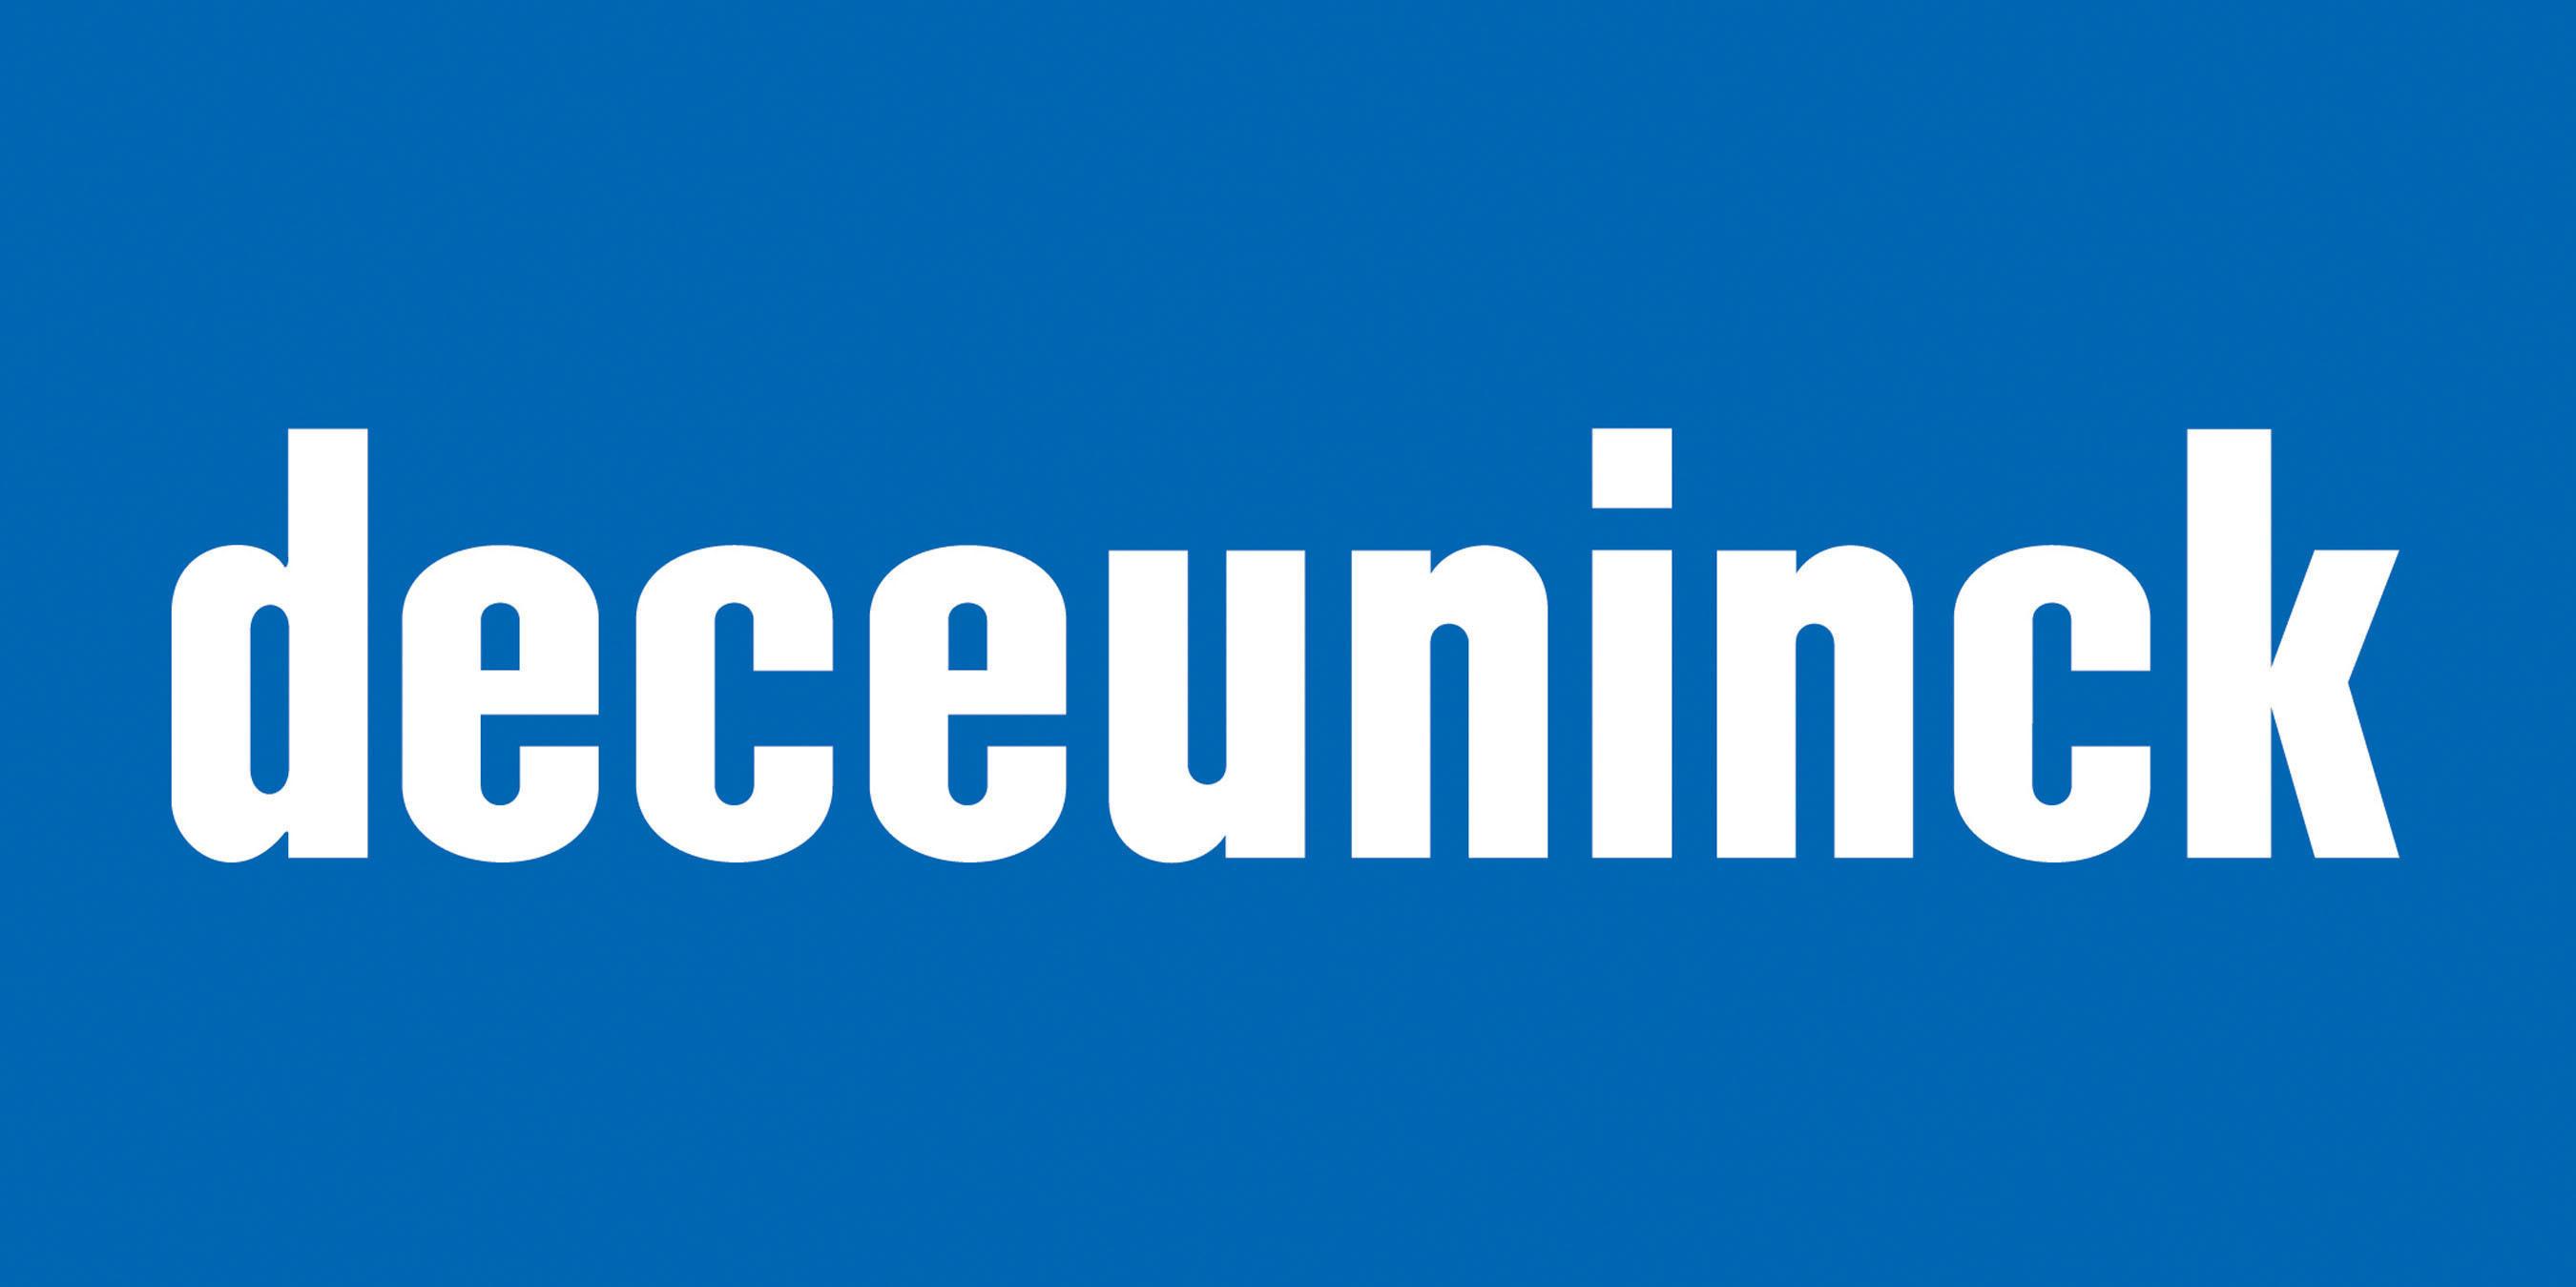 Deceuninck North America